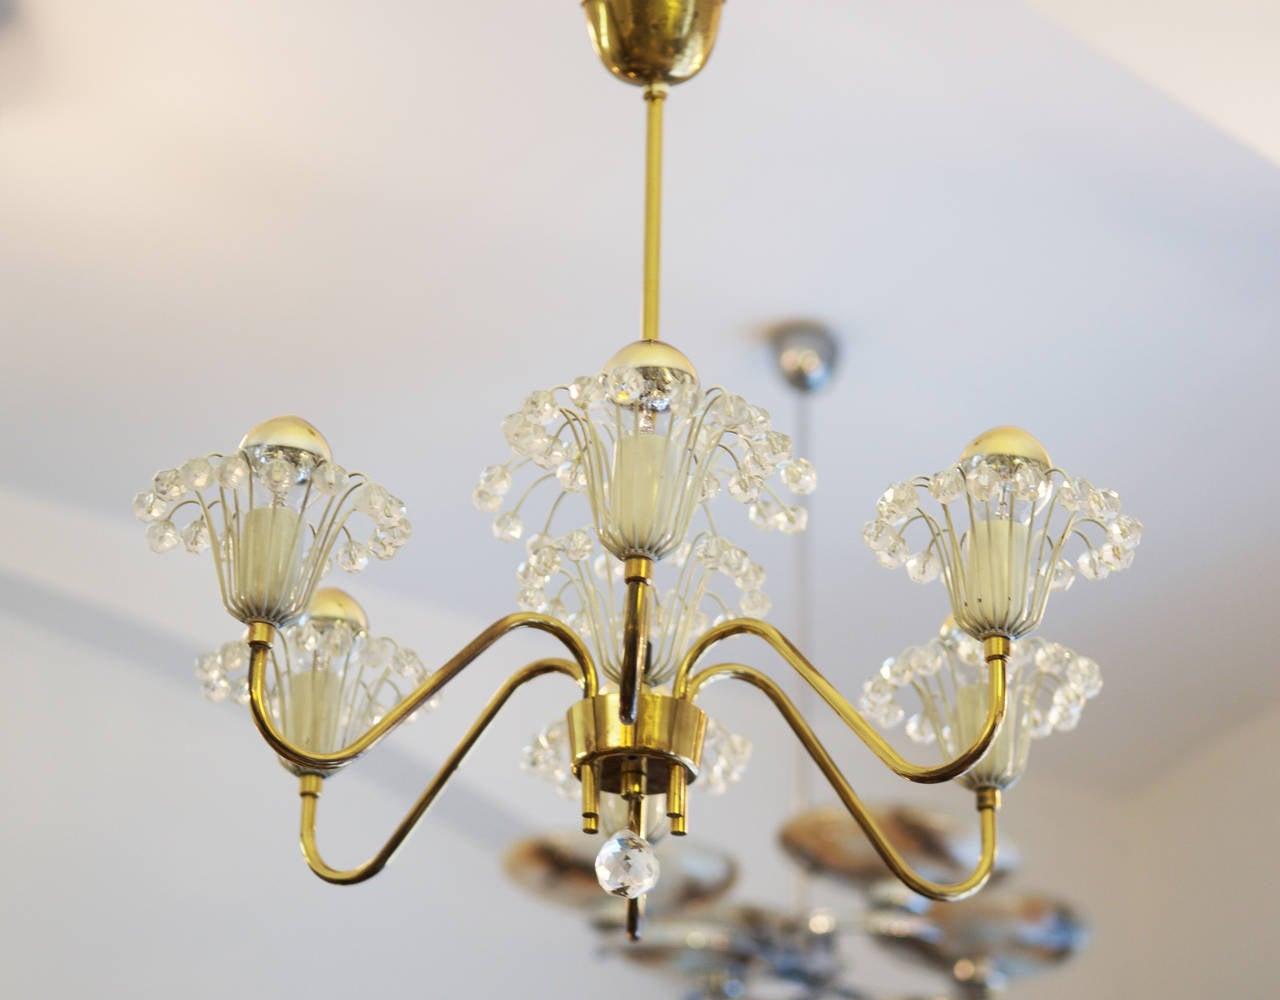 Mid-Century Modern Brass Fountain Chandelier by Emil Stejnar for Rupert Nikoll For Sale